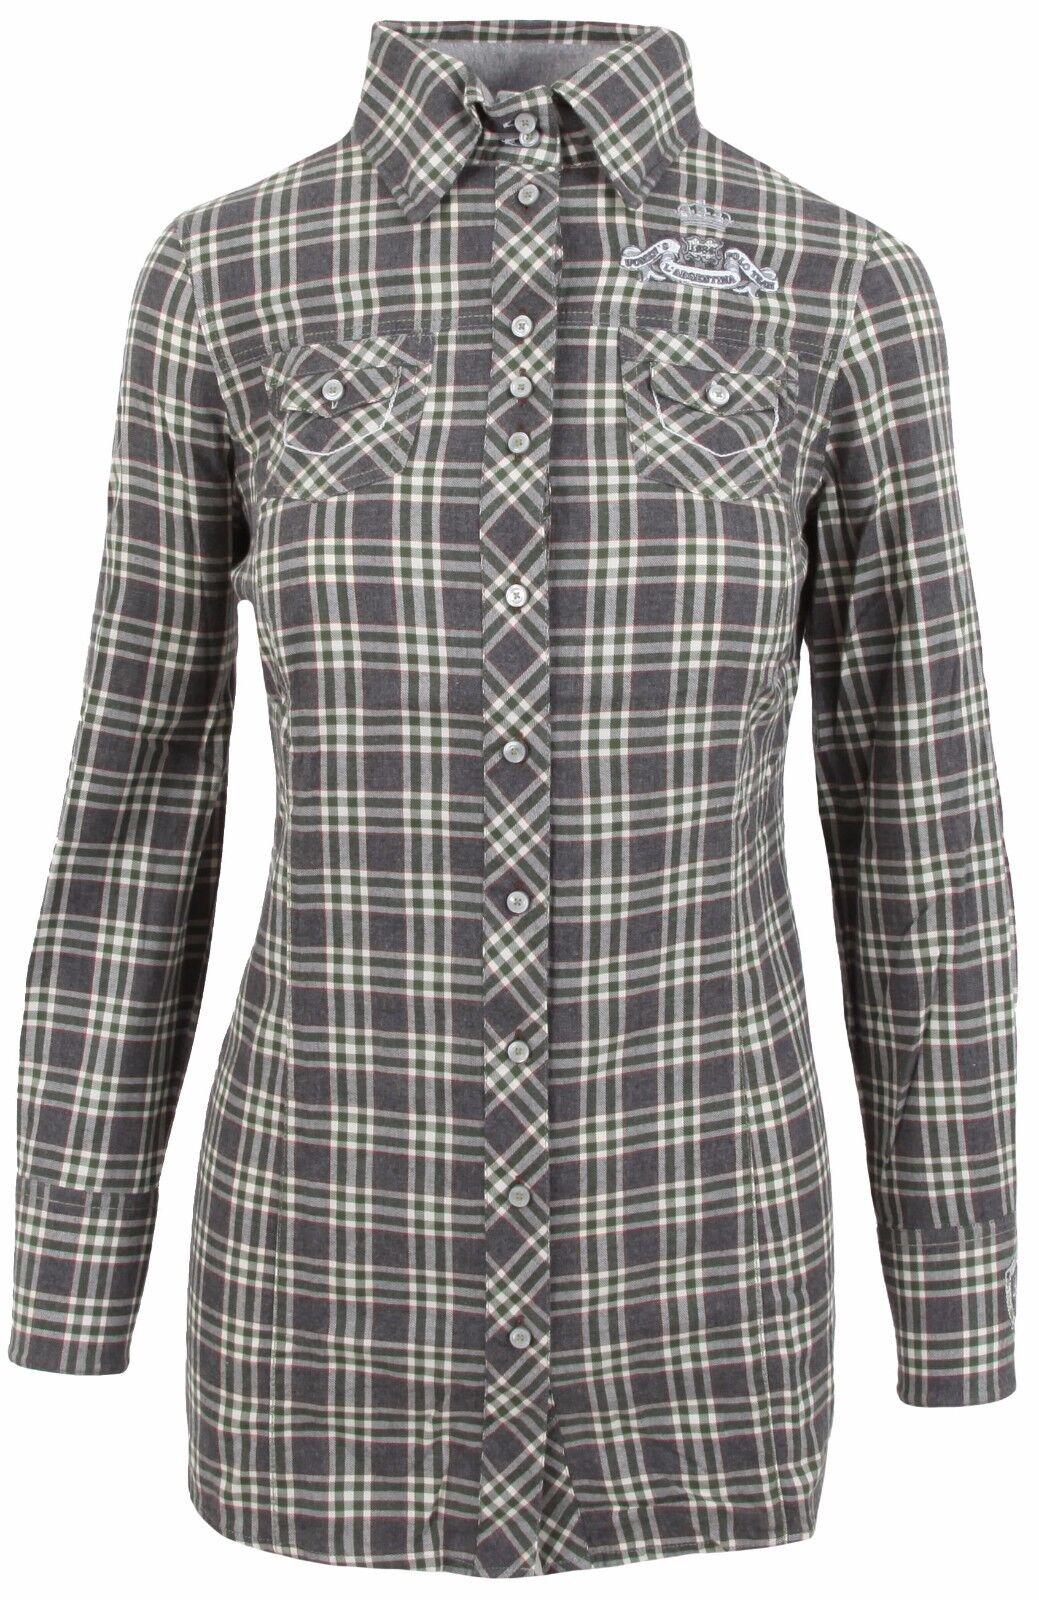 6a7b0be64c415c L' SilberINA Damen Long Blause LongBlause Shirt Größe 38 M 100% Baumwolle  Kariert